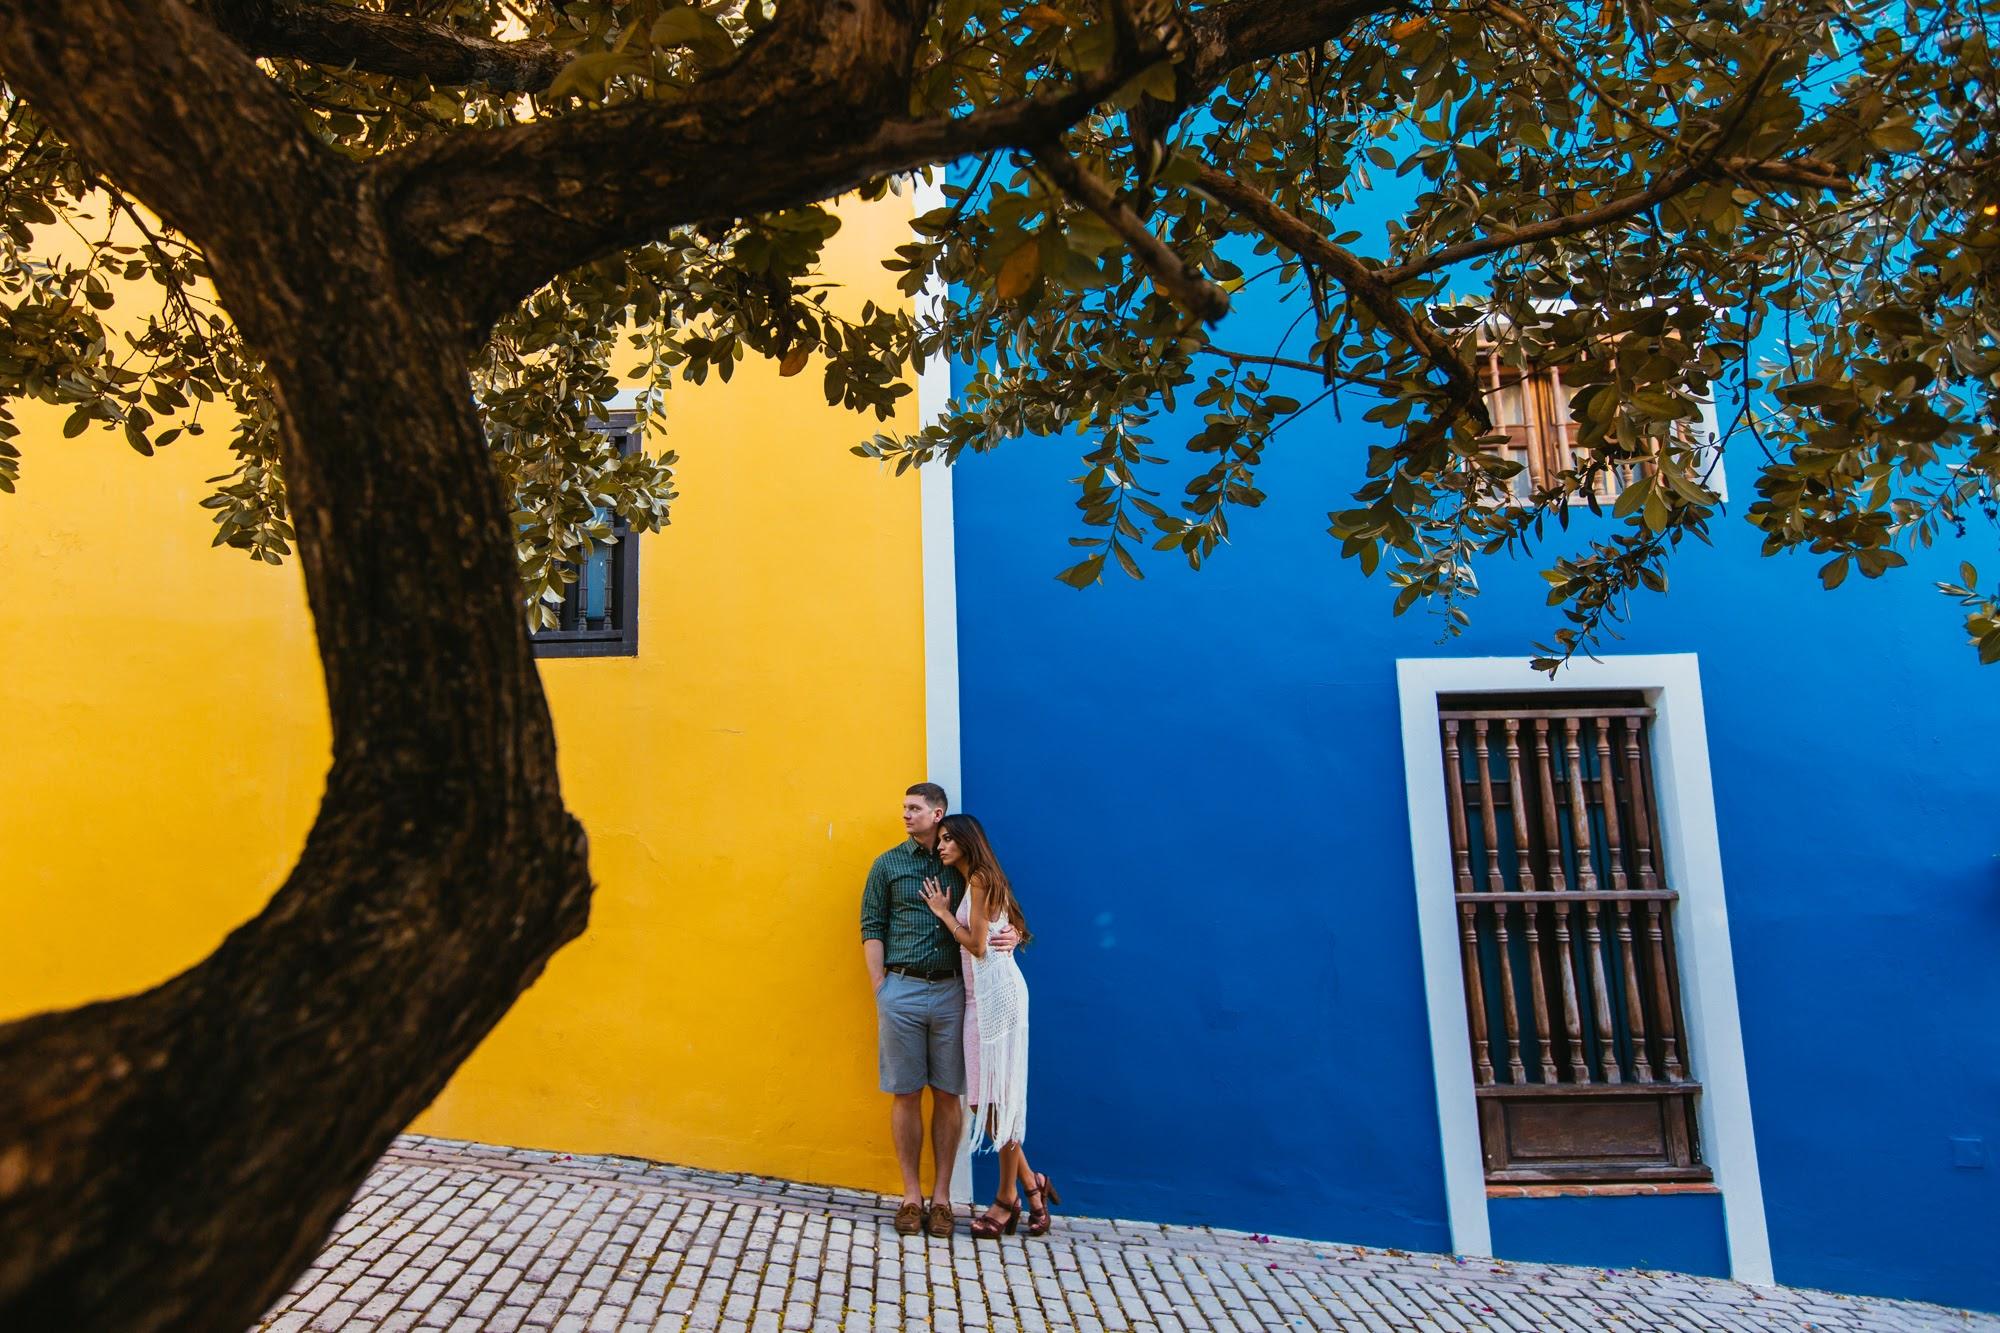 Puerto Rico Wedding Photography Destination Photographer Boris Zaretsky San Juan PR Engagement Elopement _B2C4605.jpg